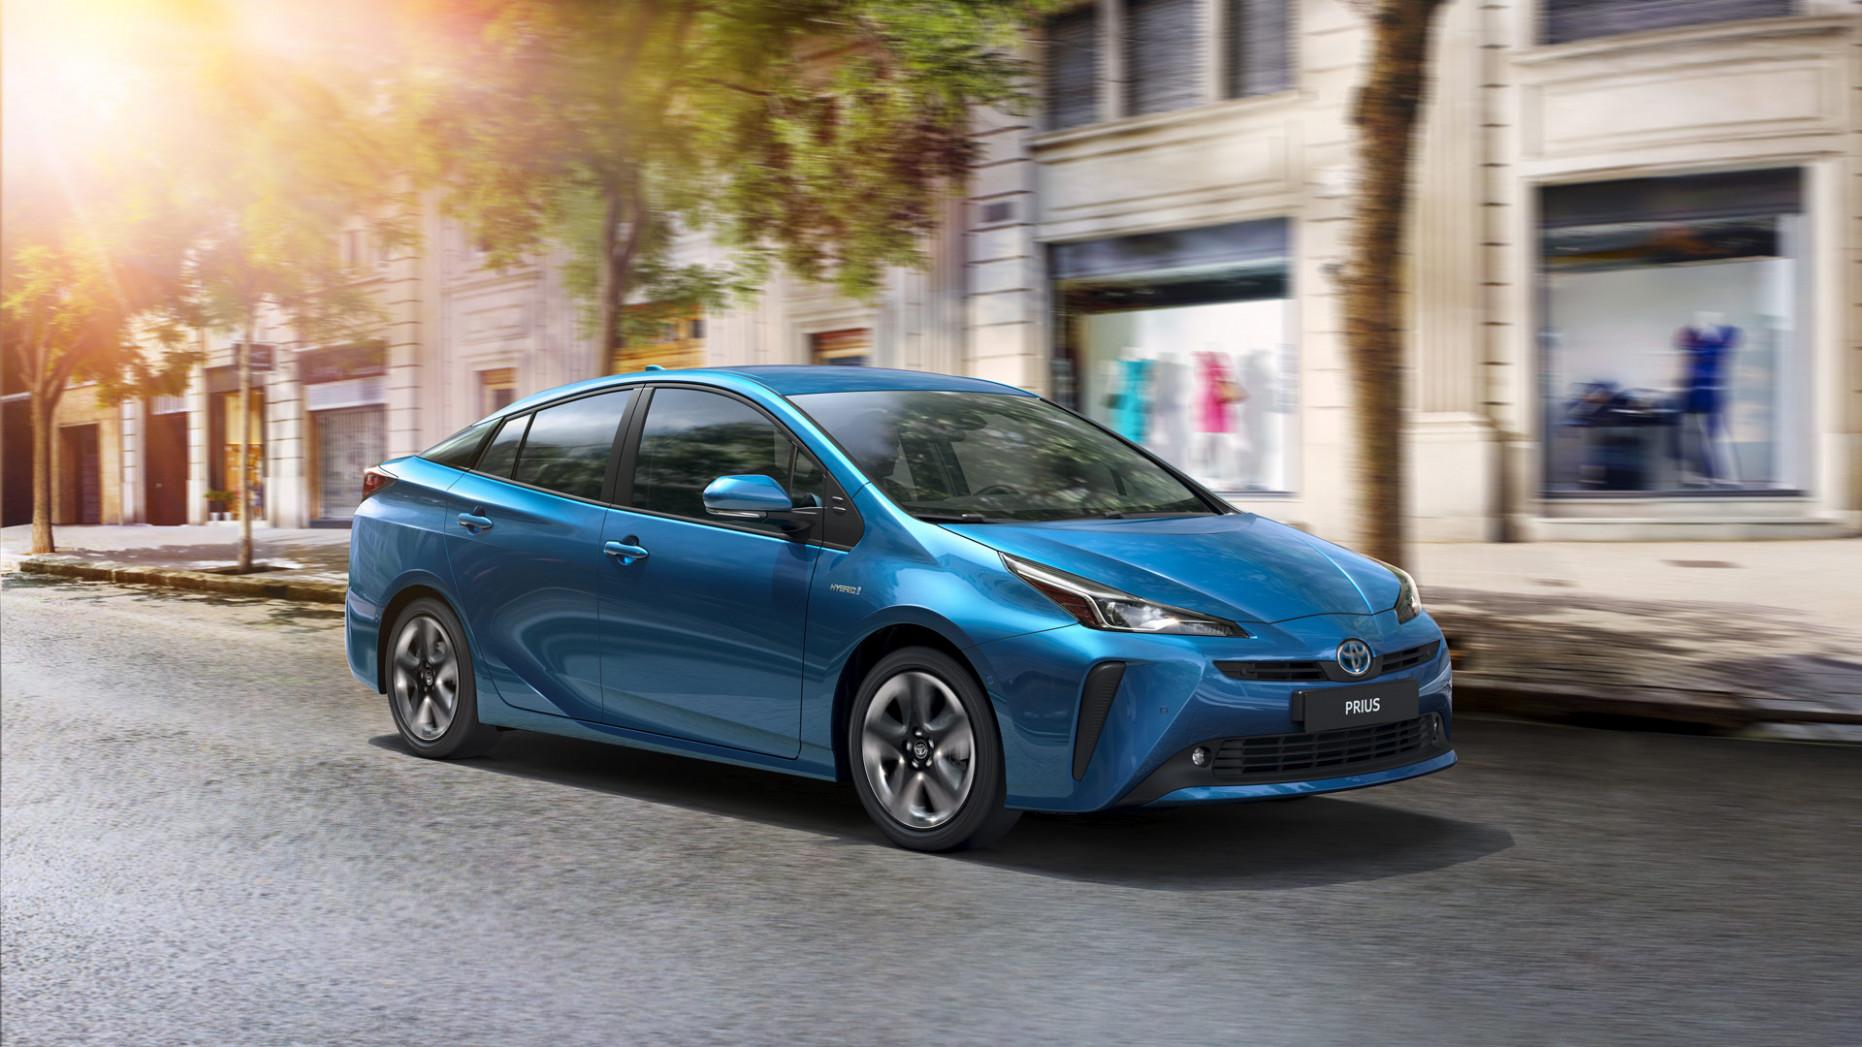 Spesification 2022 Toyota PriusPictures